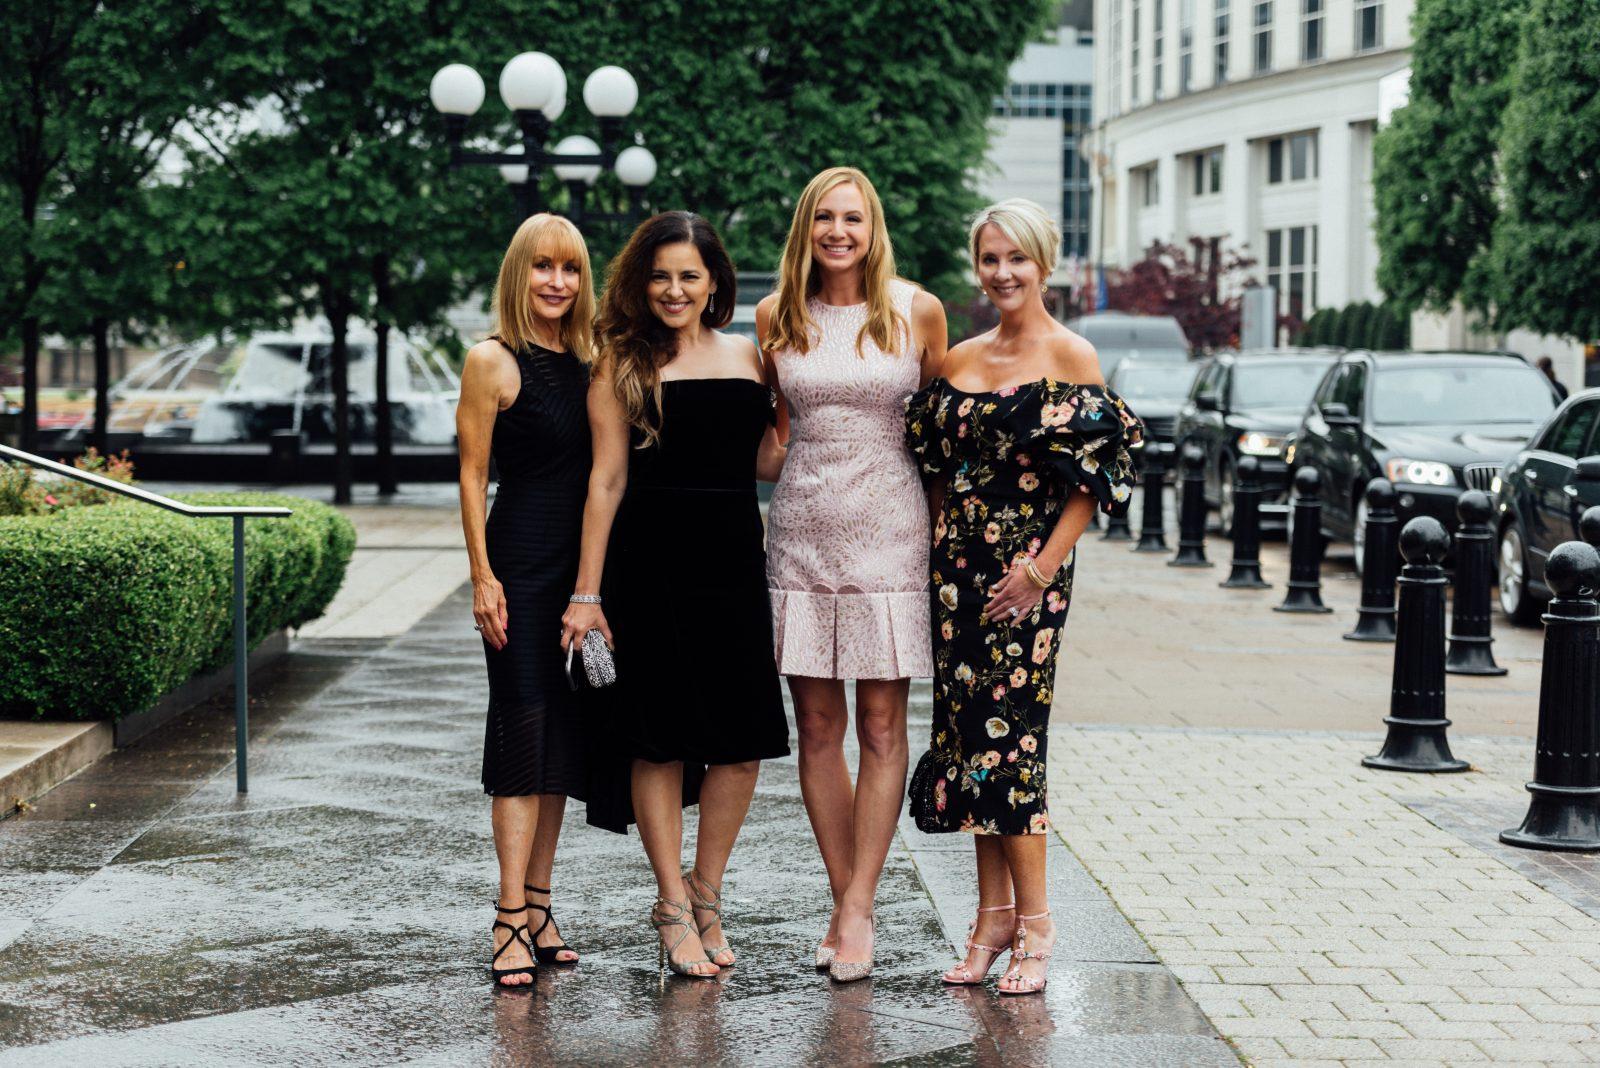 Stacey Rhodes wearing Stacey Rhodes Boutique; Vivian Lavin Fernandez in Zang Toi; Danielle Breezy in Lily Pulitzer; Emily Humphreys wearing Monique L'Huillier